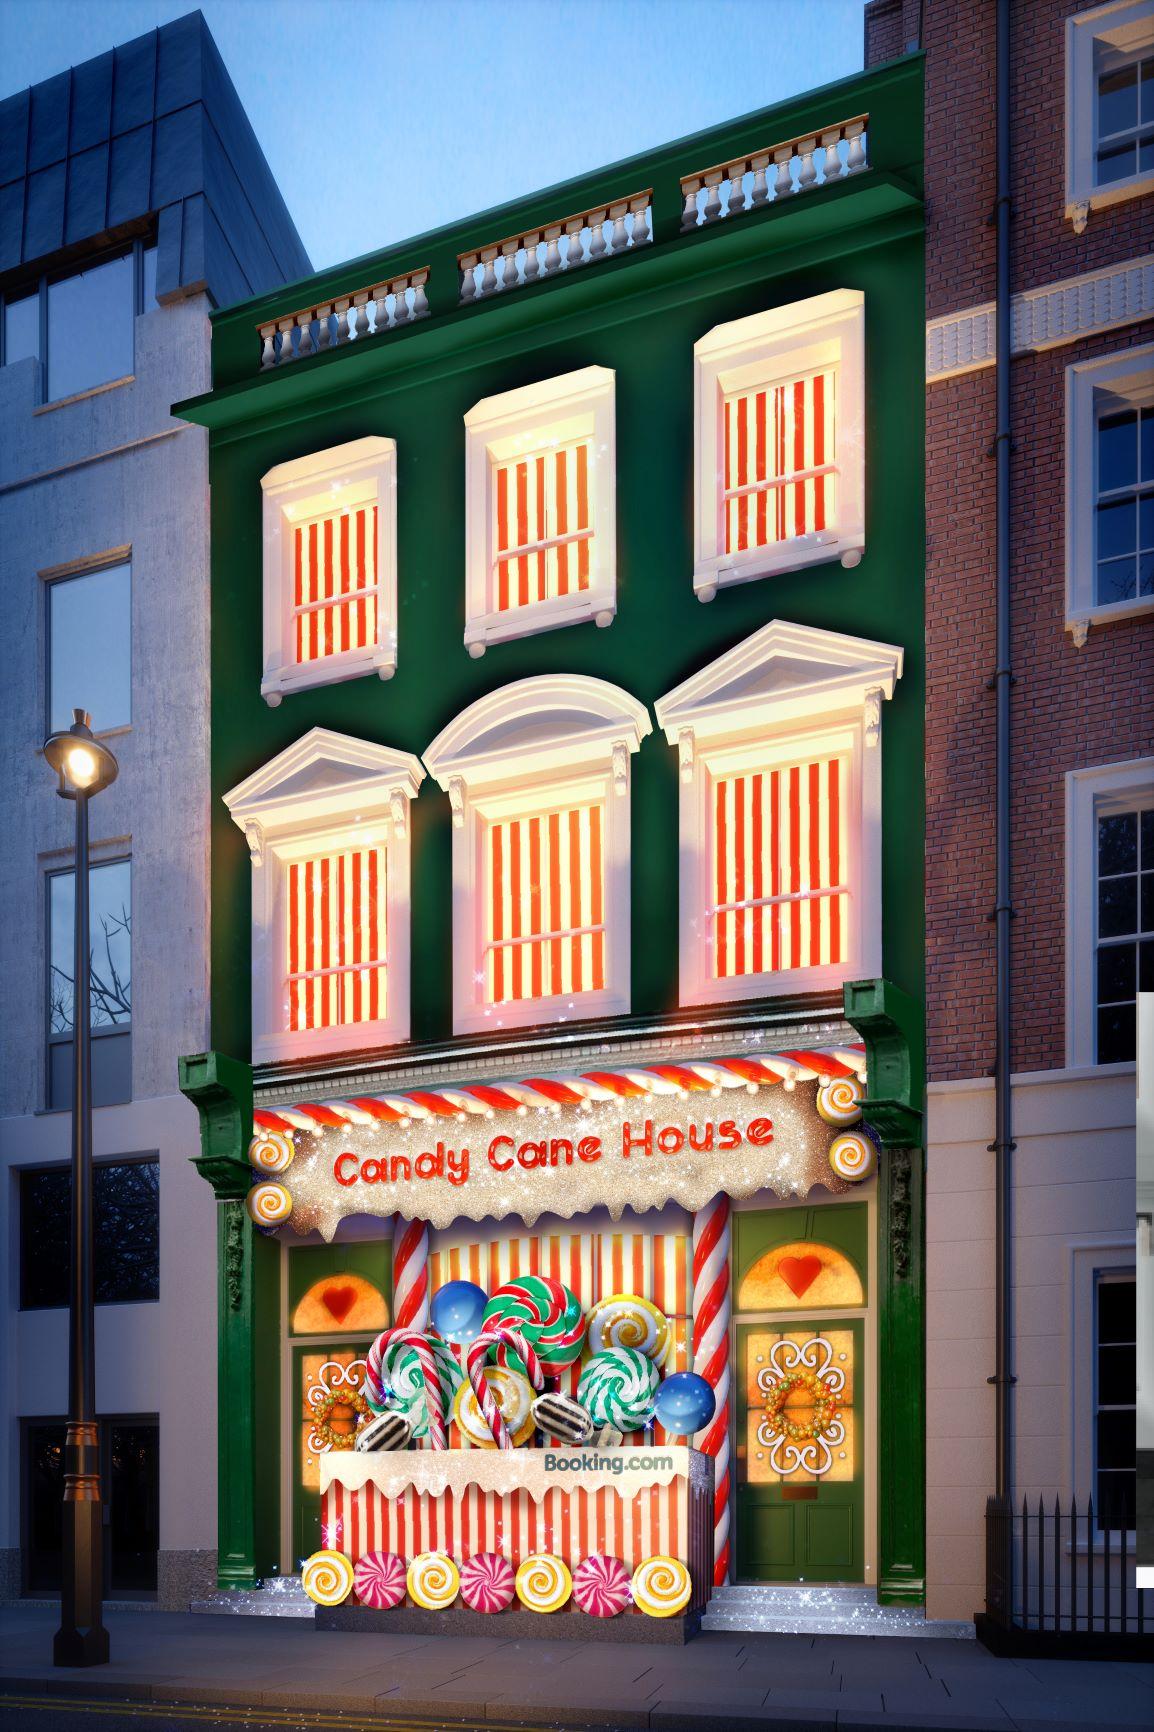 Booking.com เปิดตัว Candy Cane House ที่พักที่หวานที่สุดเท่าที่เคยมีมา 19 - Booking.com